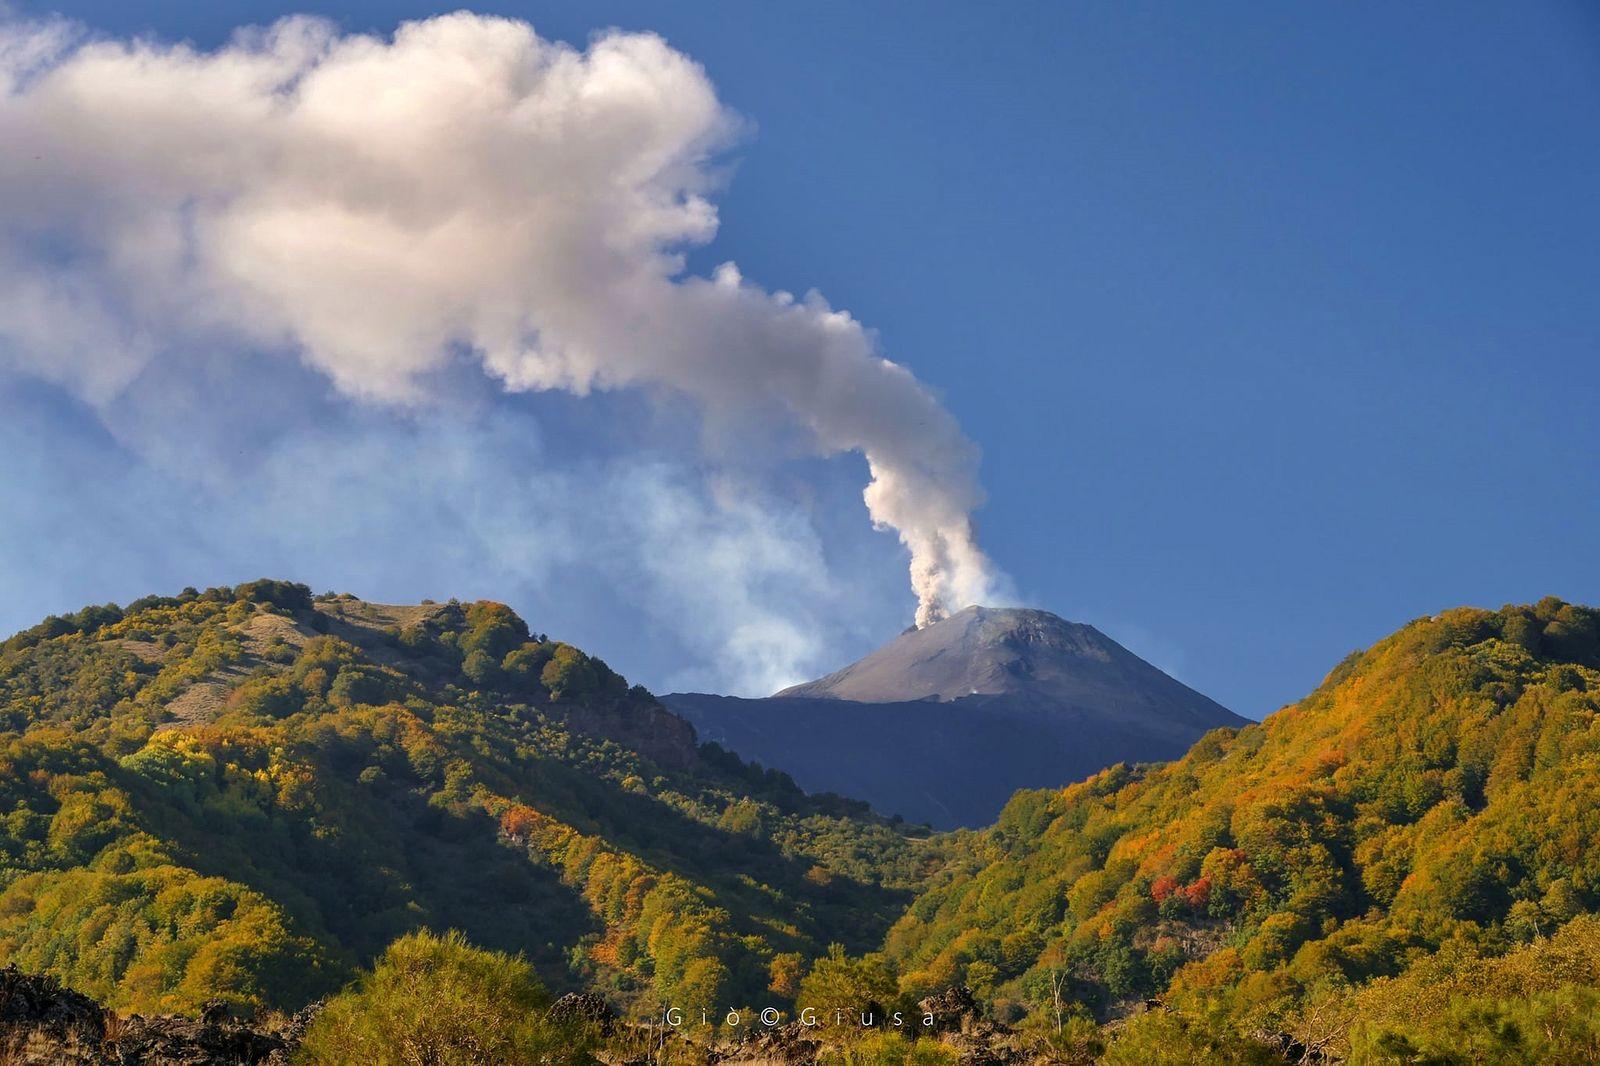 "Etna NSEC ""mouth of the saddle"" - degassing on 22.10.2020 - photo Gio Giusa"